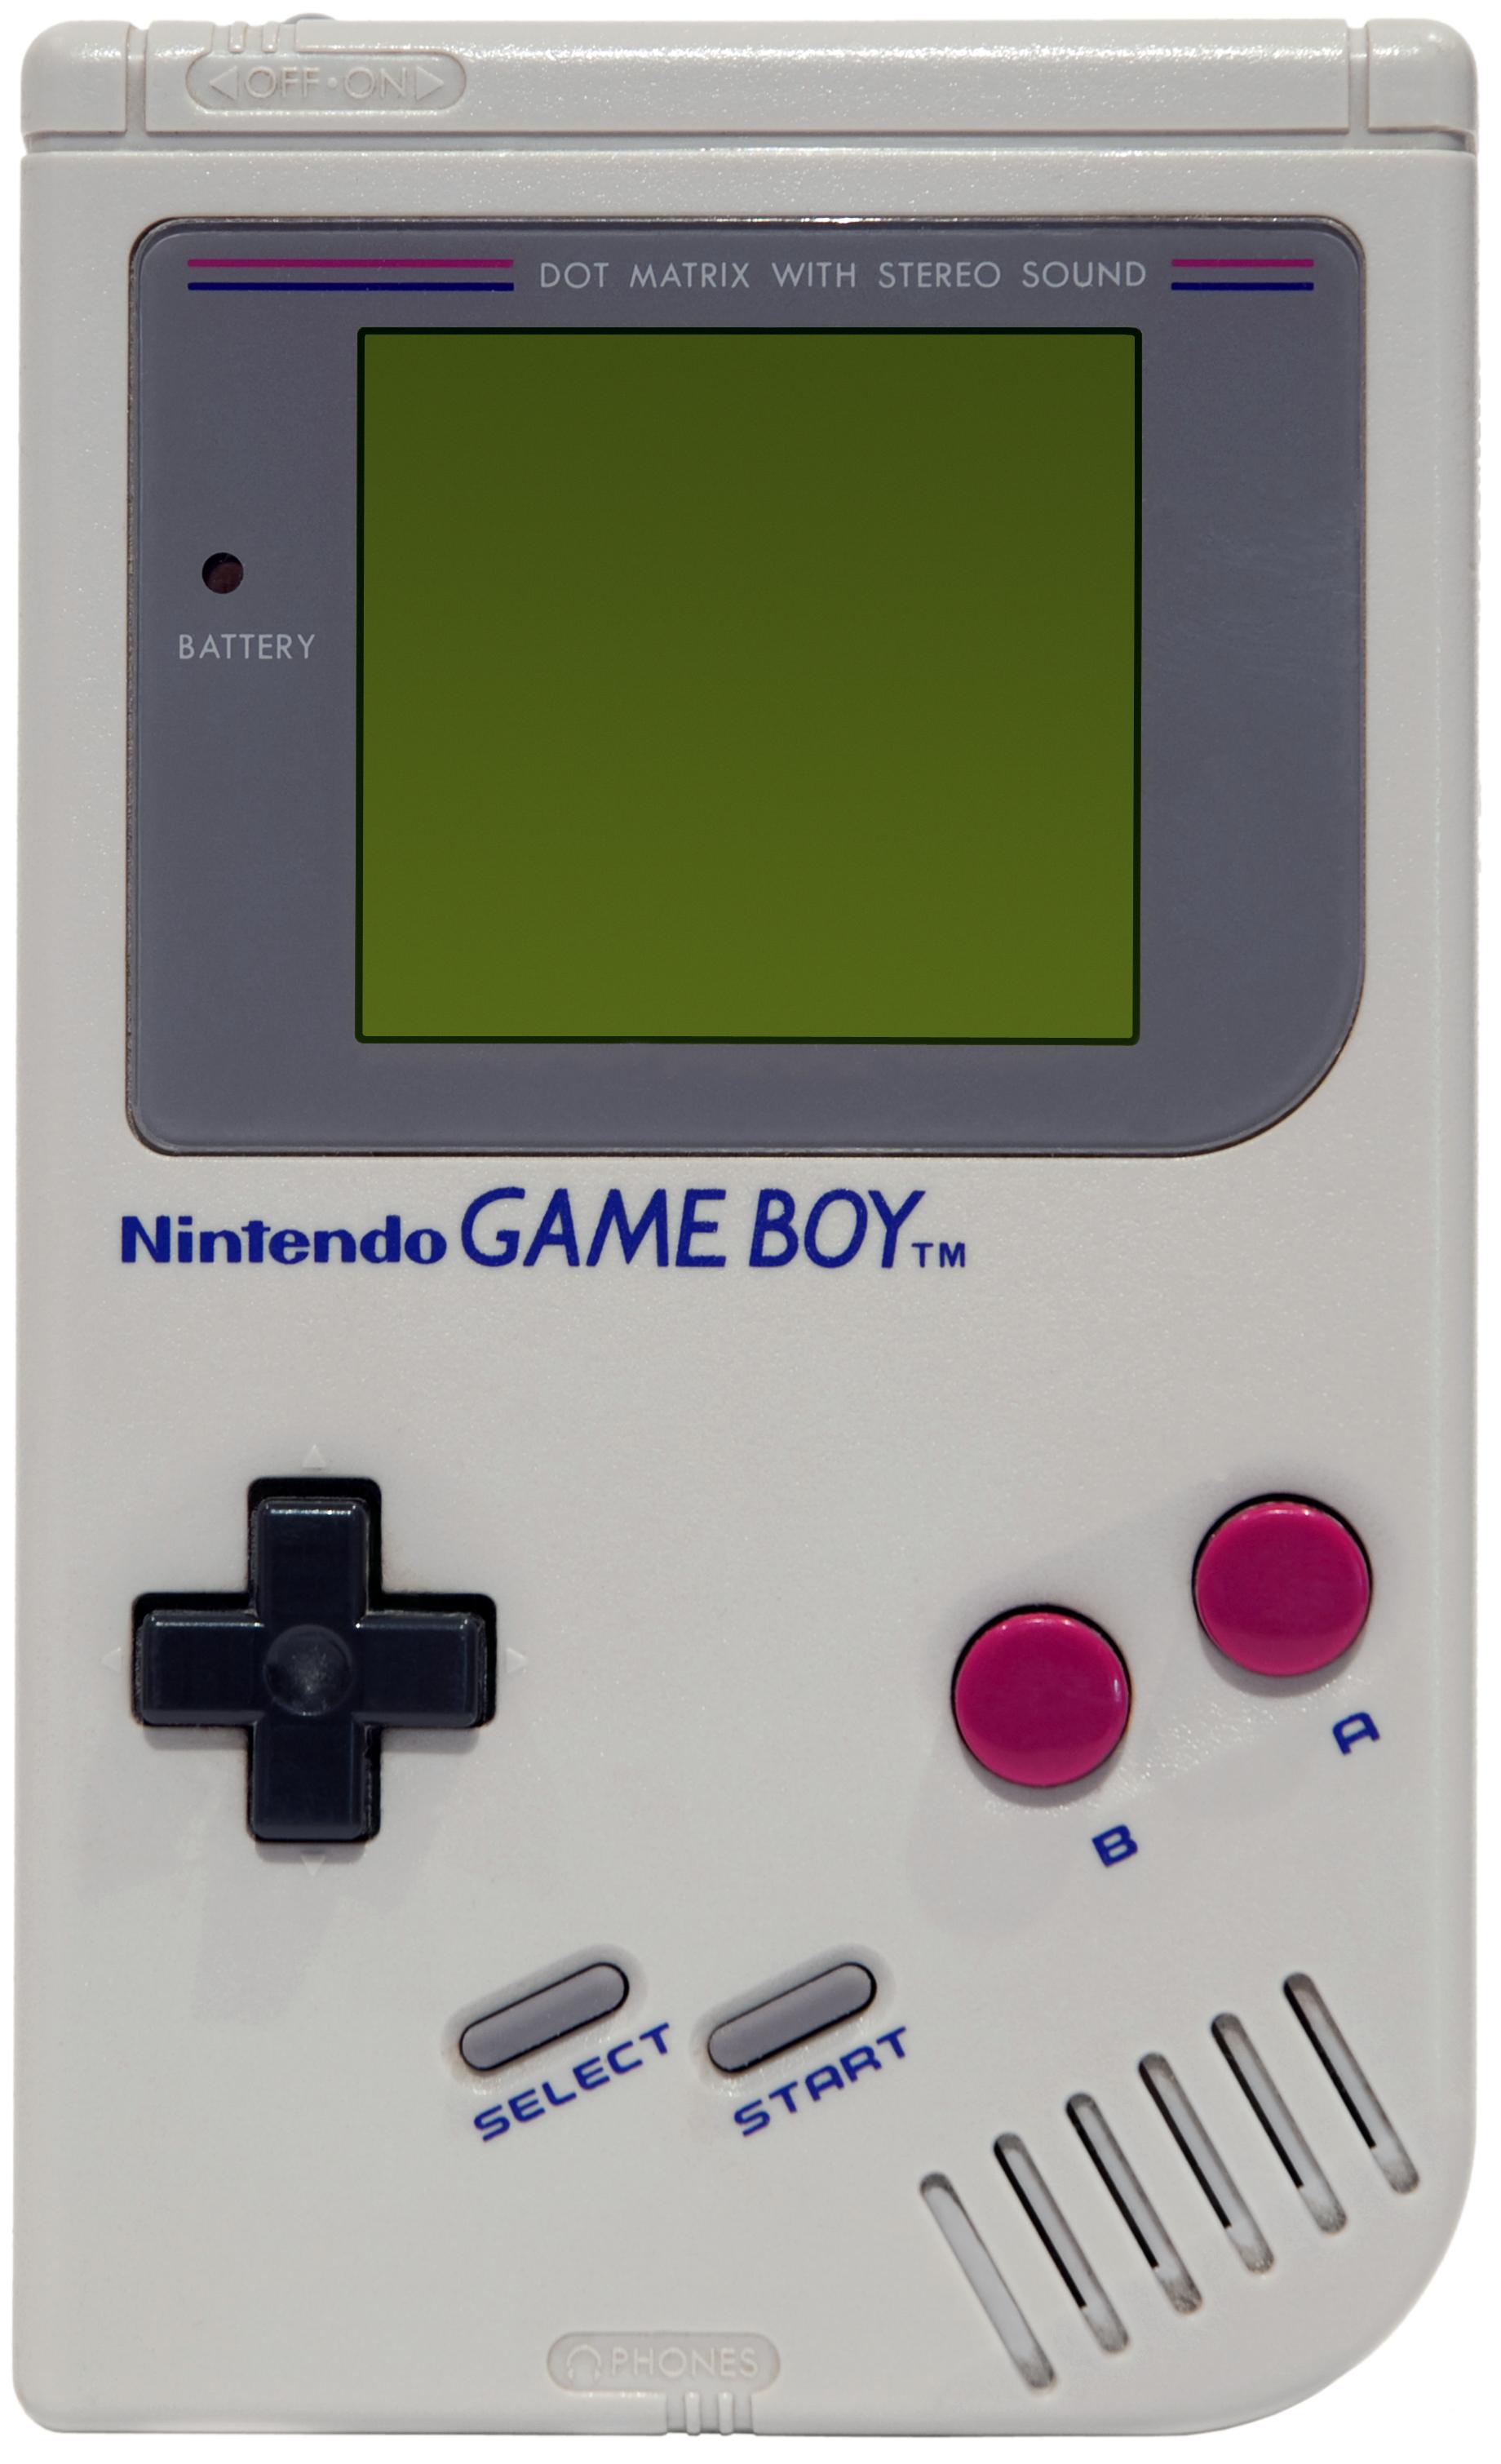 Pokemon games for gameboy color - Game Boy Grey Model